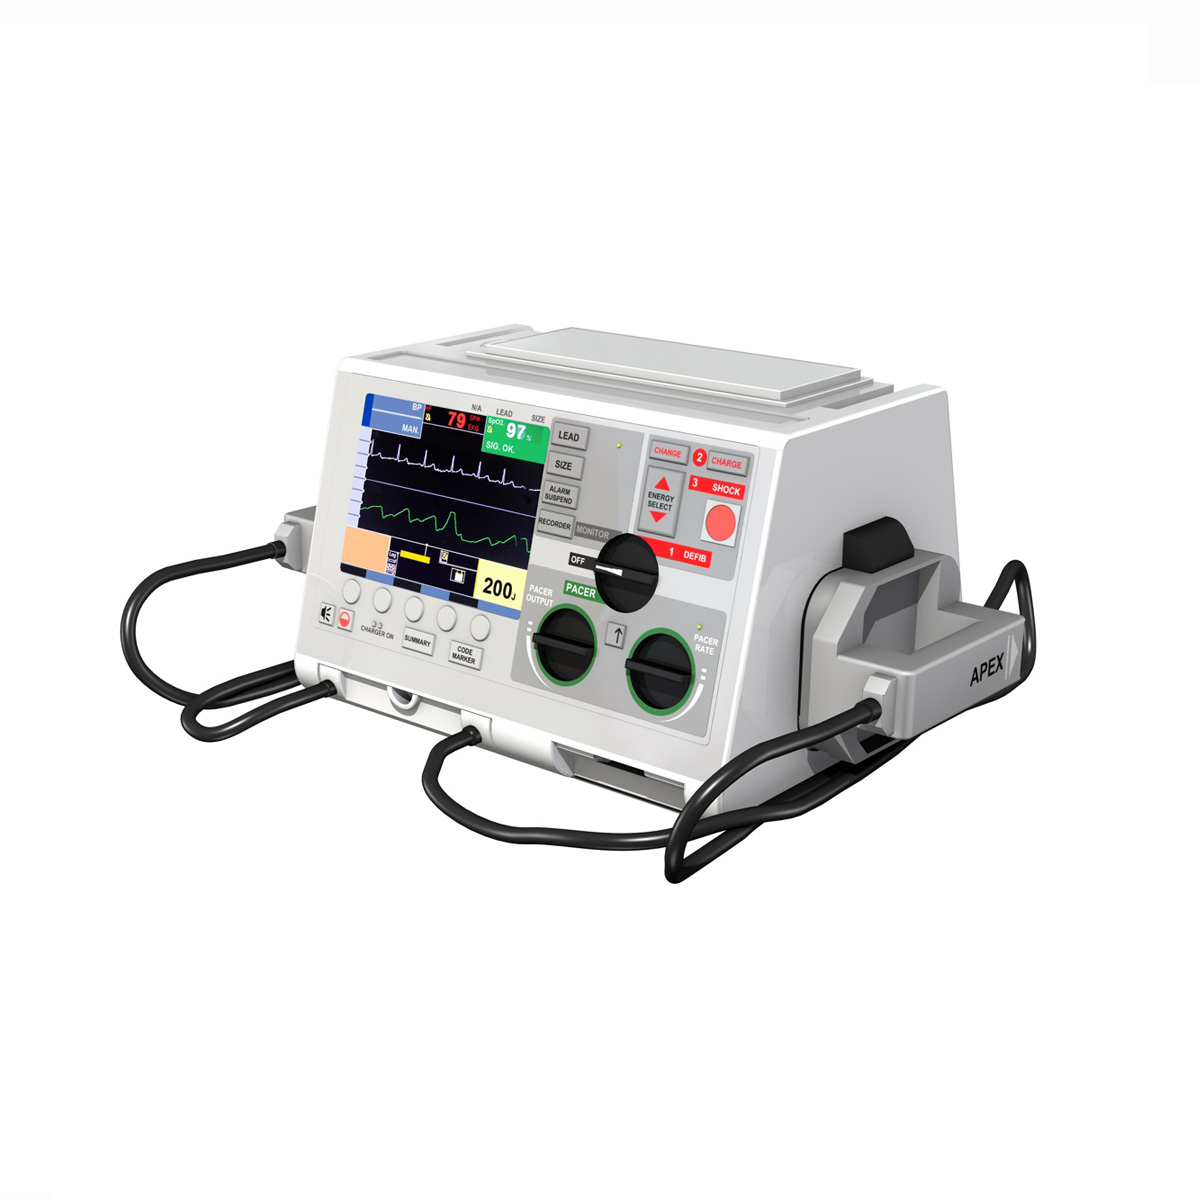 defibrillator 3d model 3ds c4d lwo obj 264214